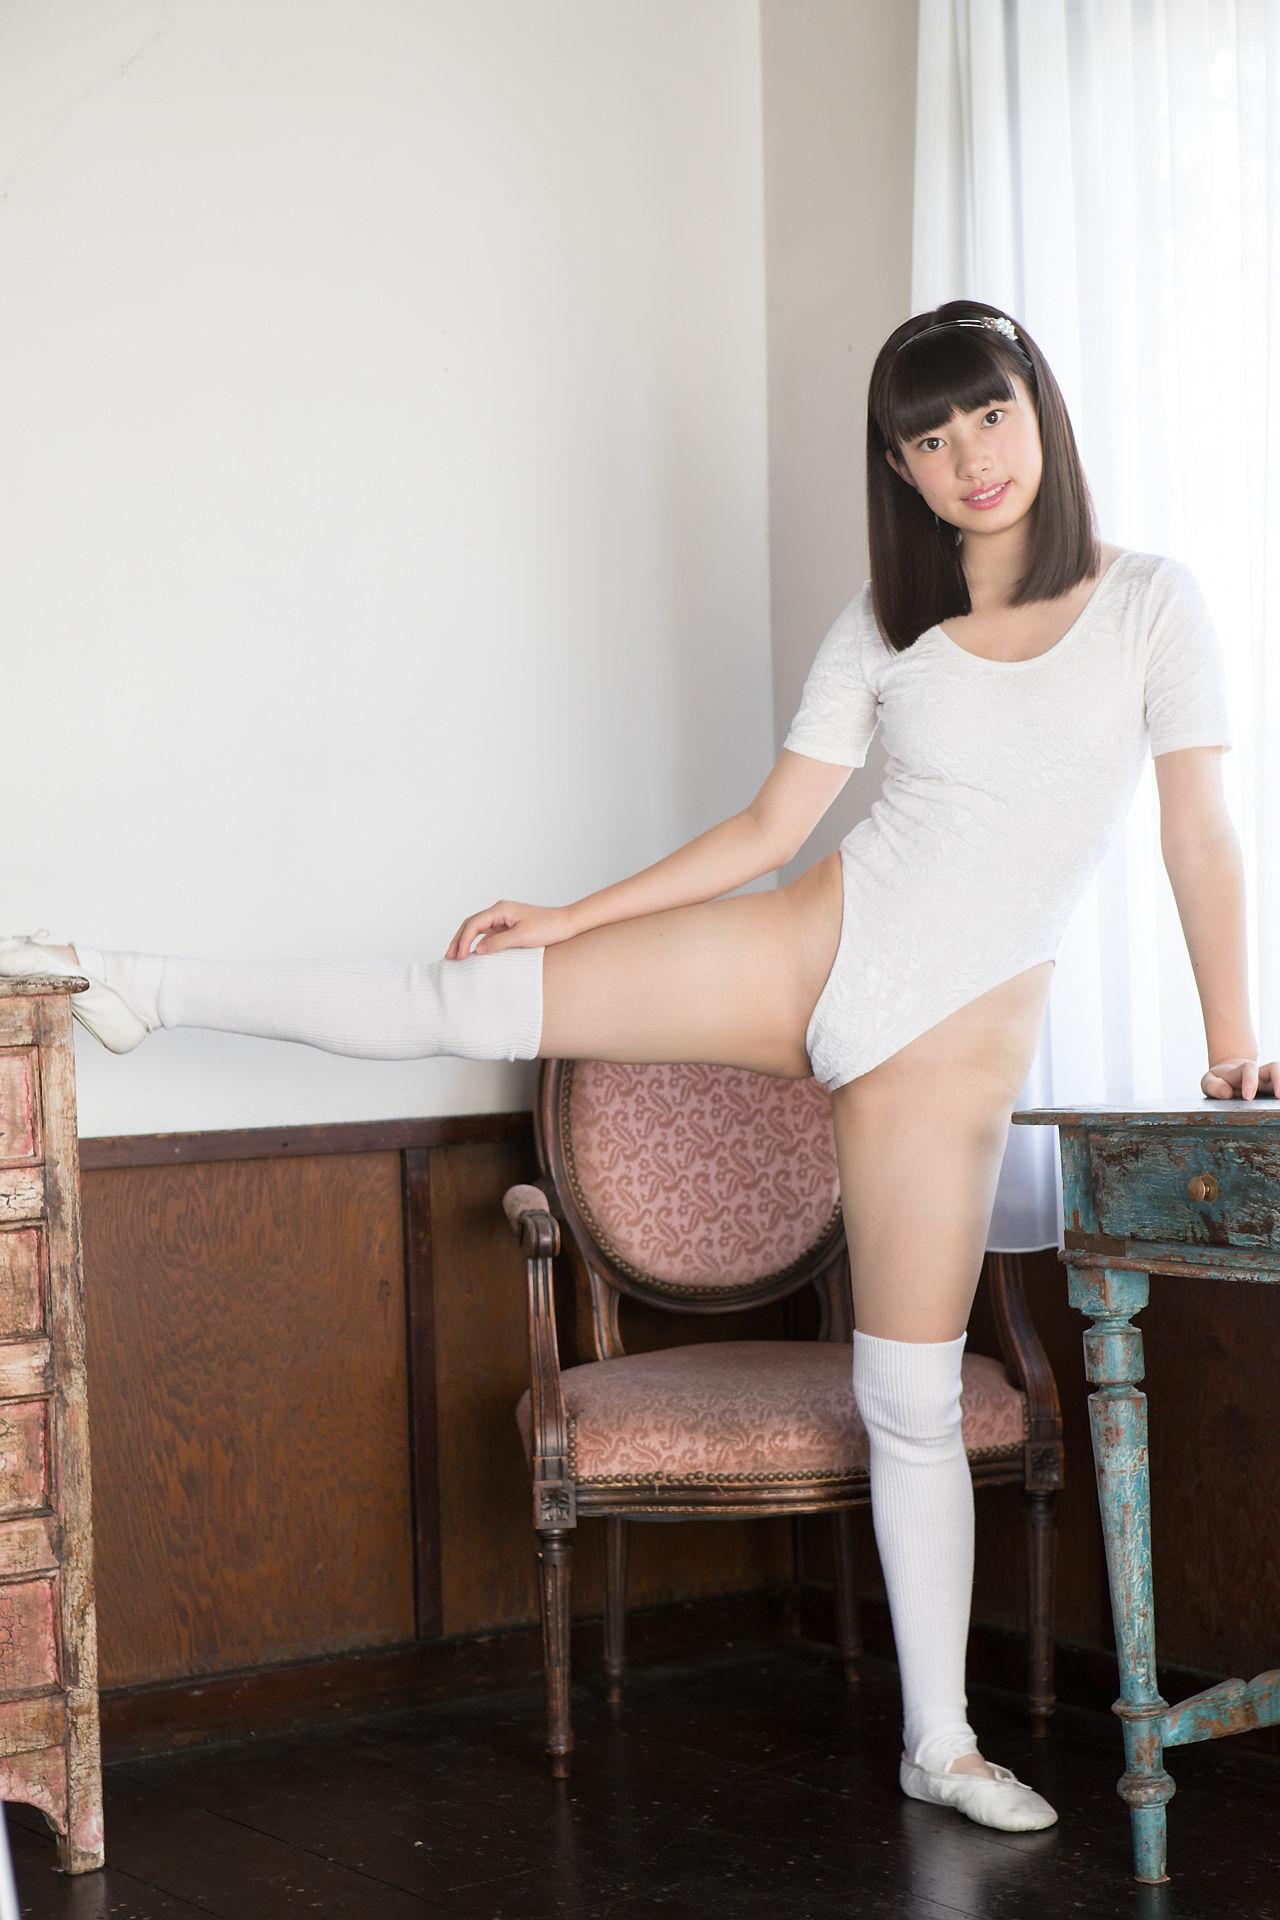 [Minisuka] 東雲せな Sena Shinonome - Secret Gallery  STAGE1 4.2[62P]